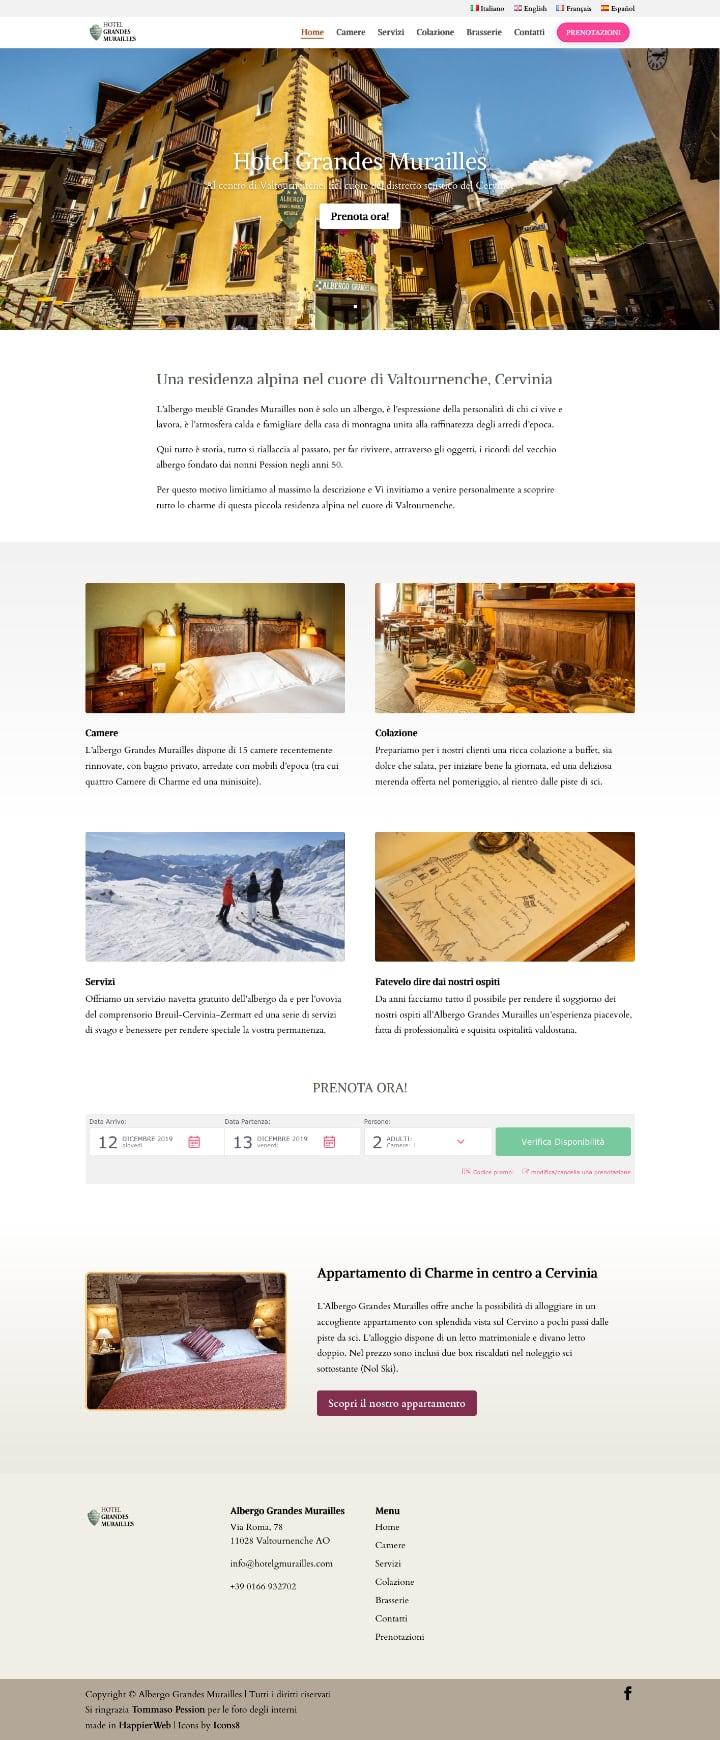 Screenshot home page Hotel Grandes Murailles, Valtournenche